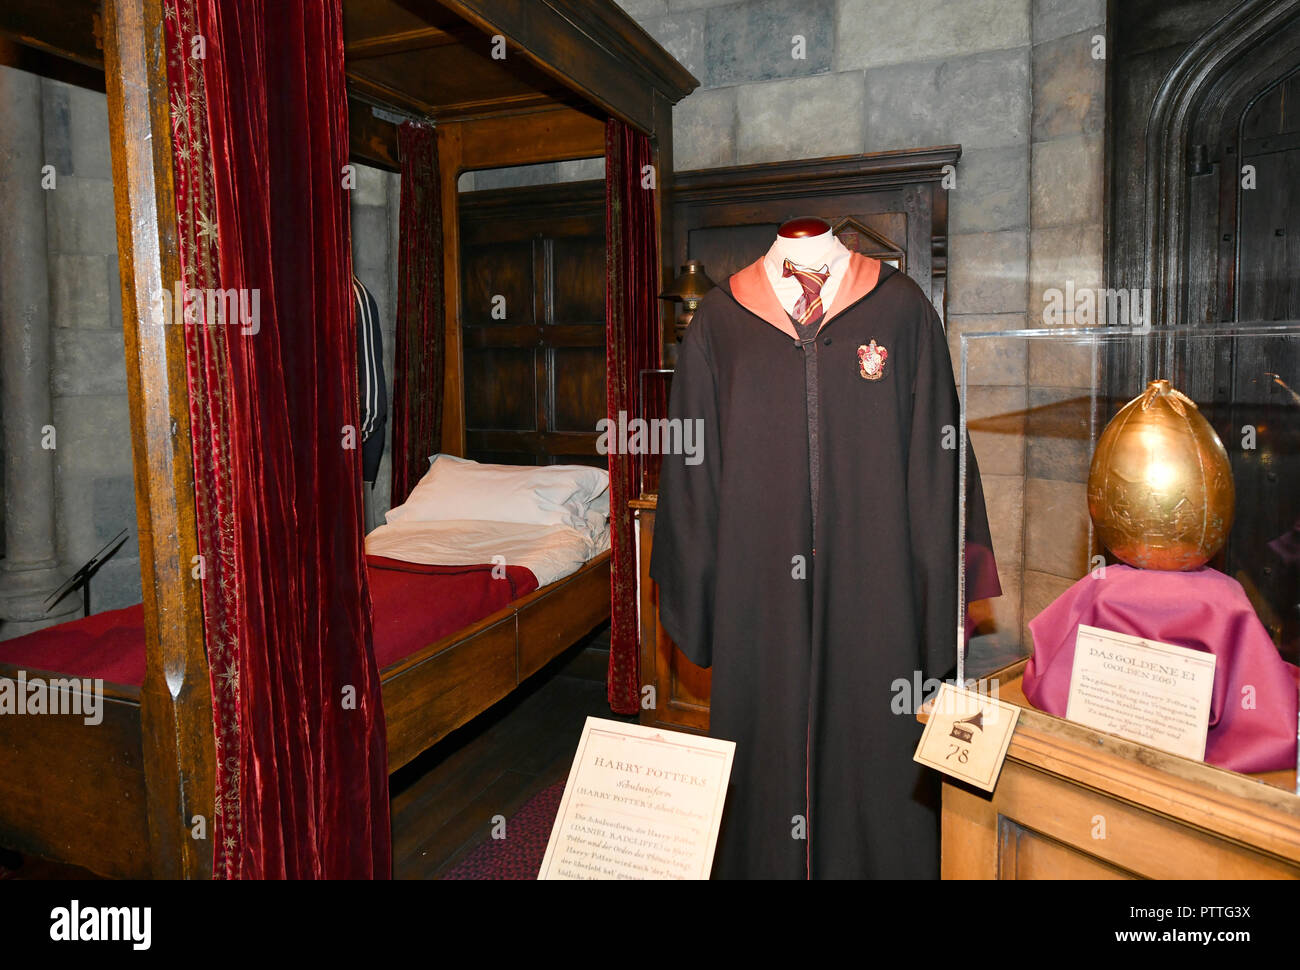 Potsdam Brandenburg 11th Oct 2018 Harry Potter S Boarding School Bed And School Uniform Are Shown In